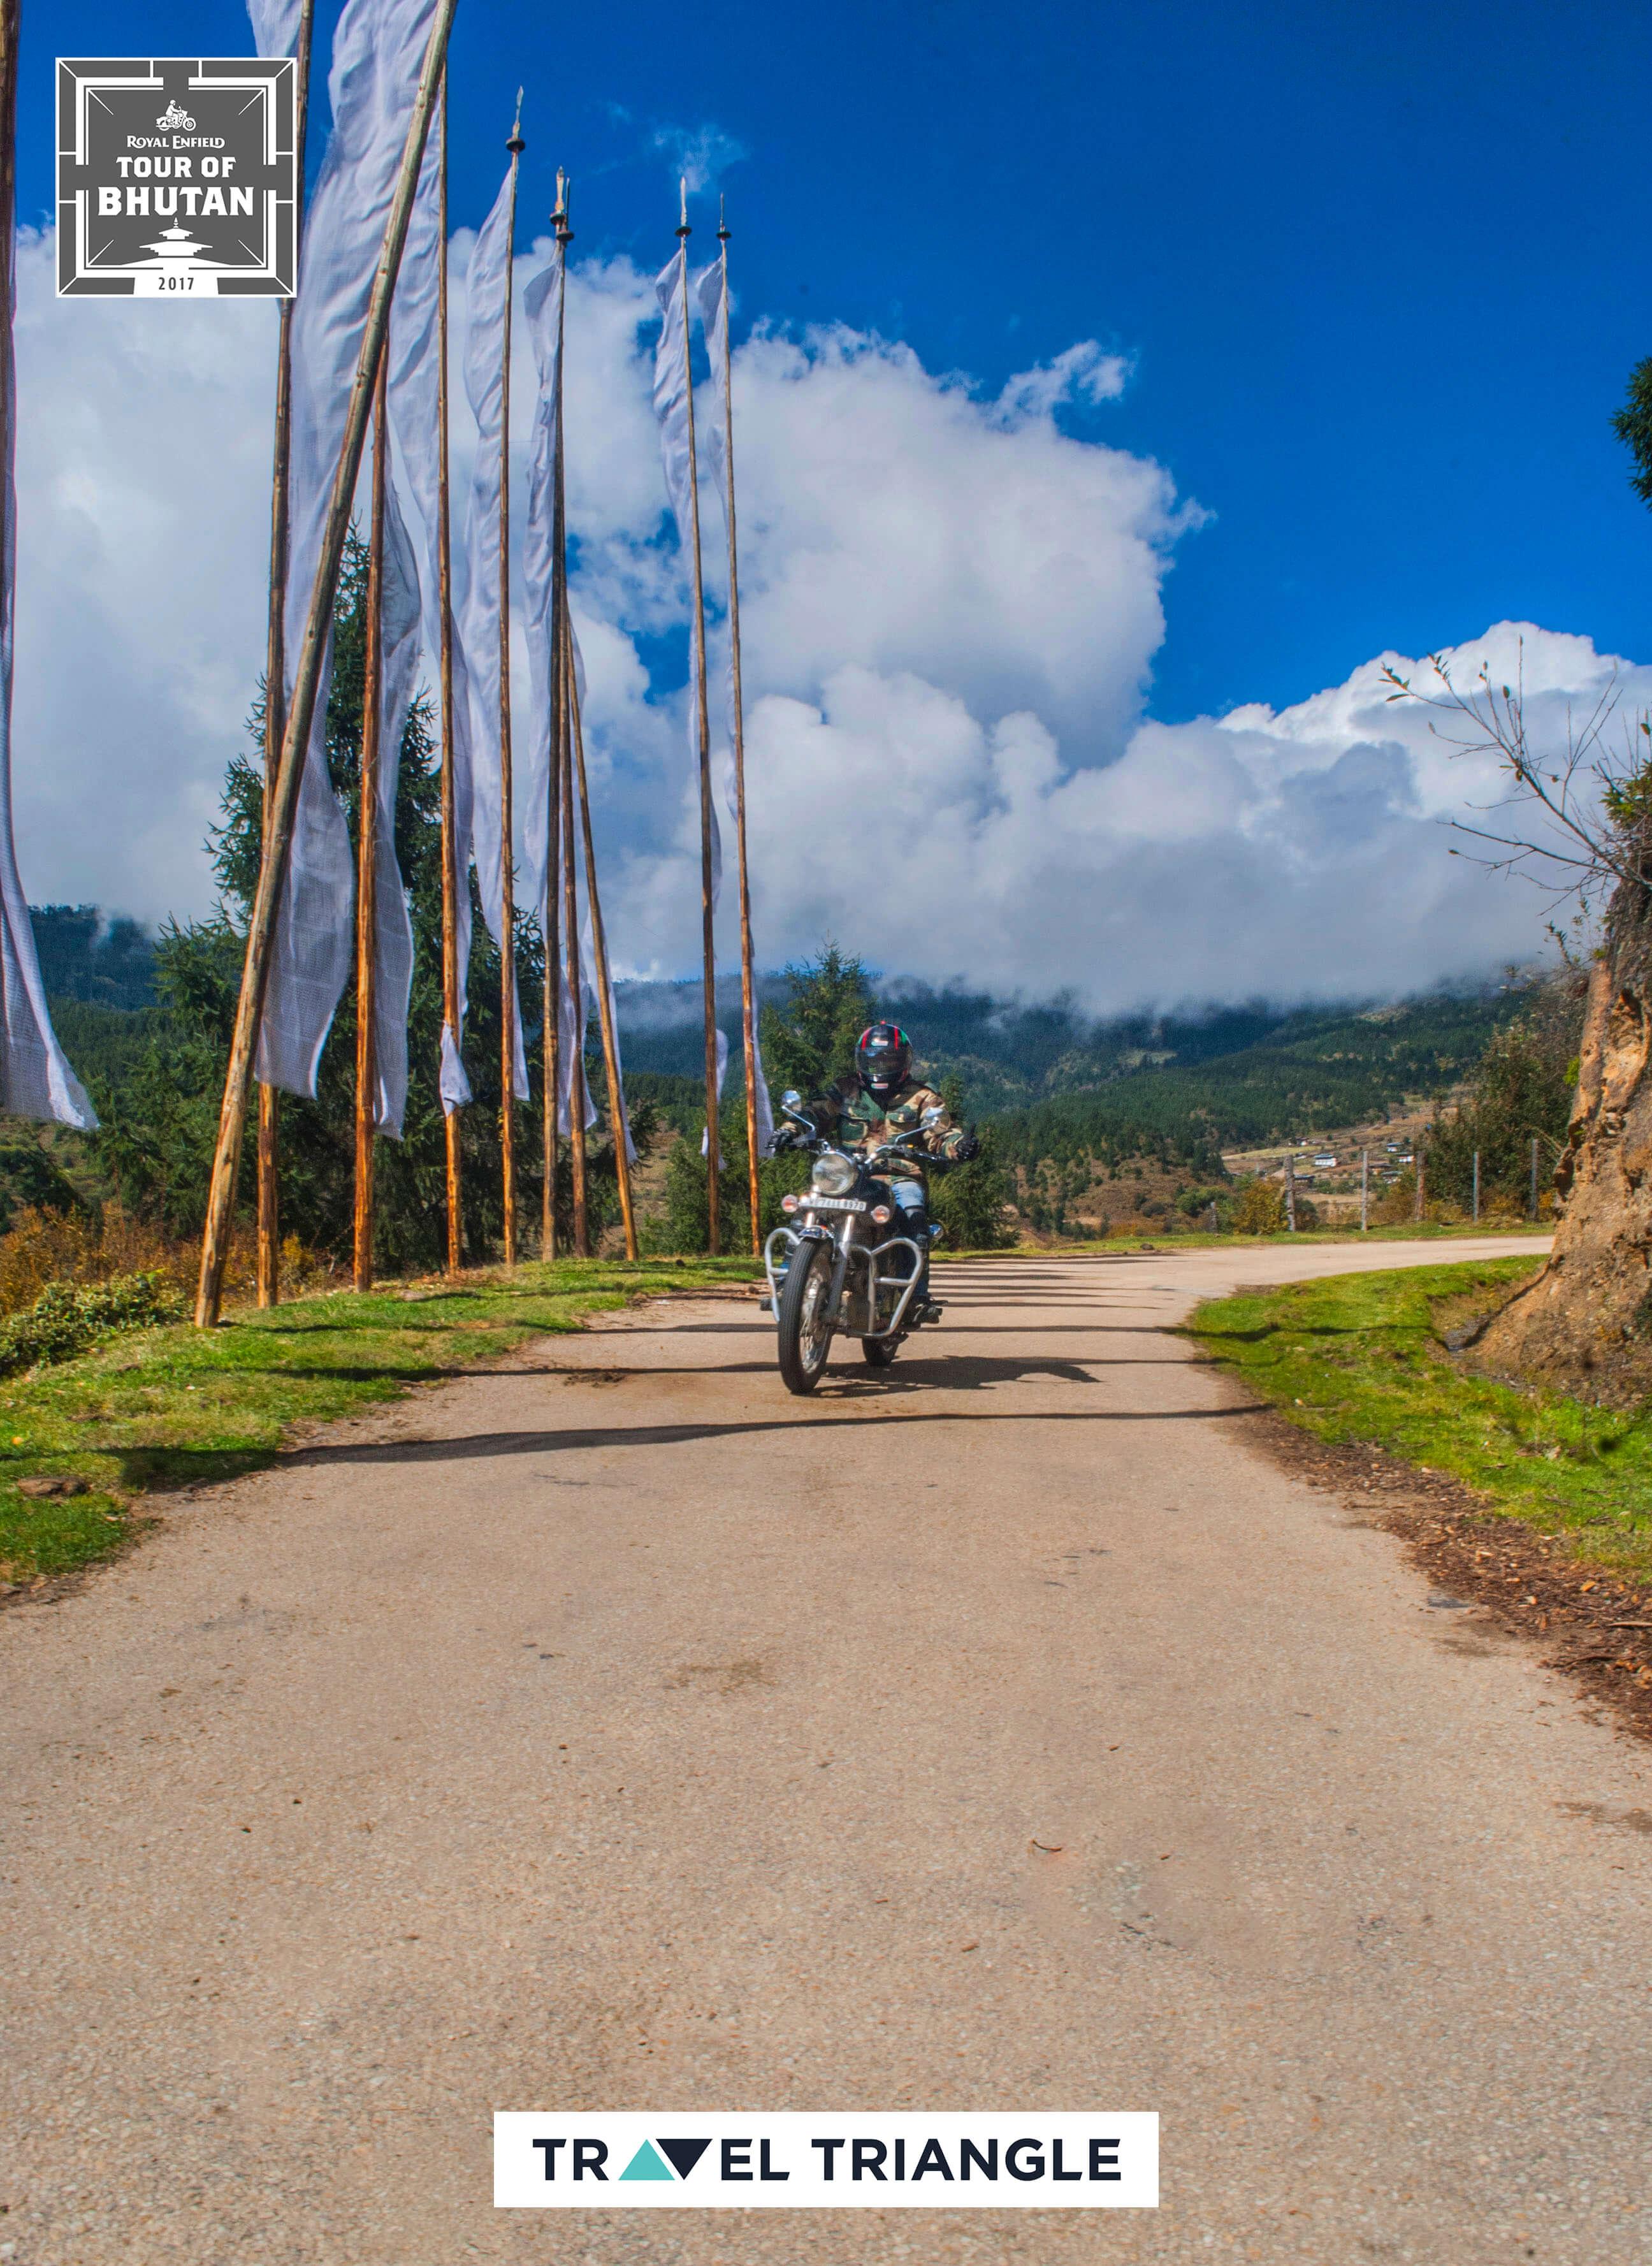 Bumthang to Mongar: riding through beautiful landscapes